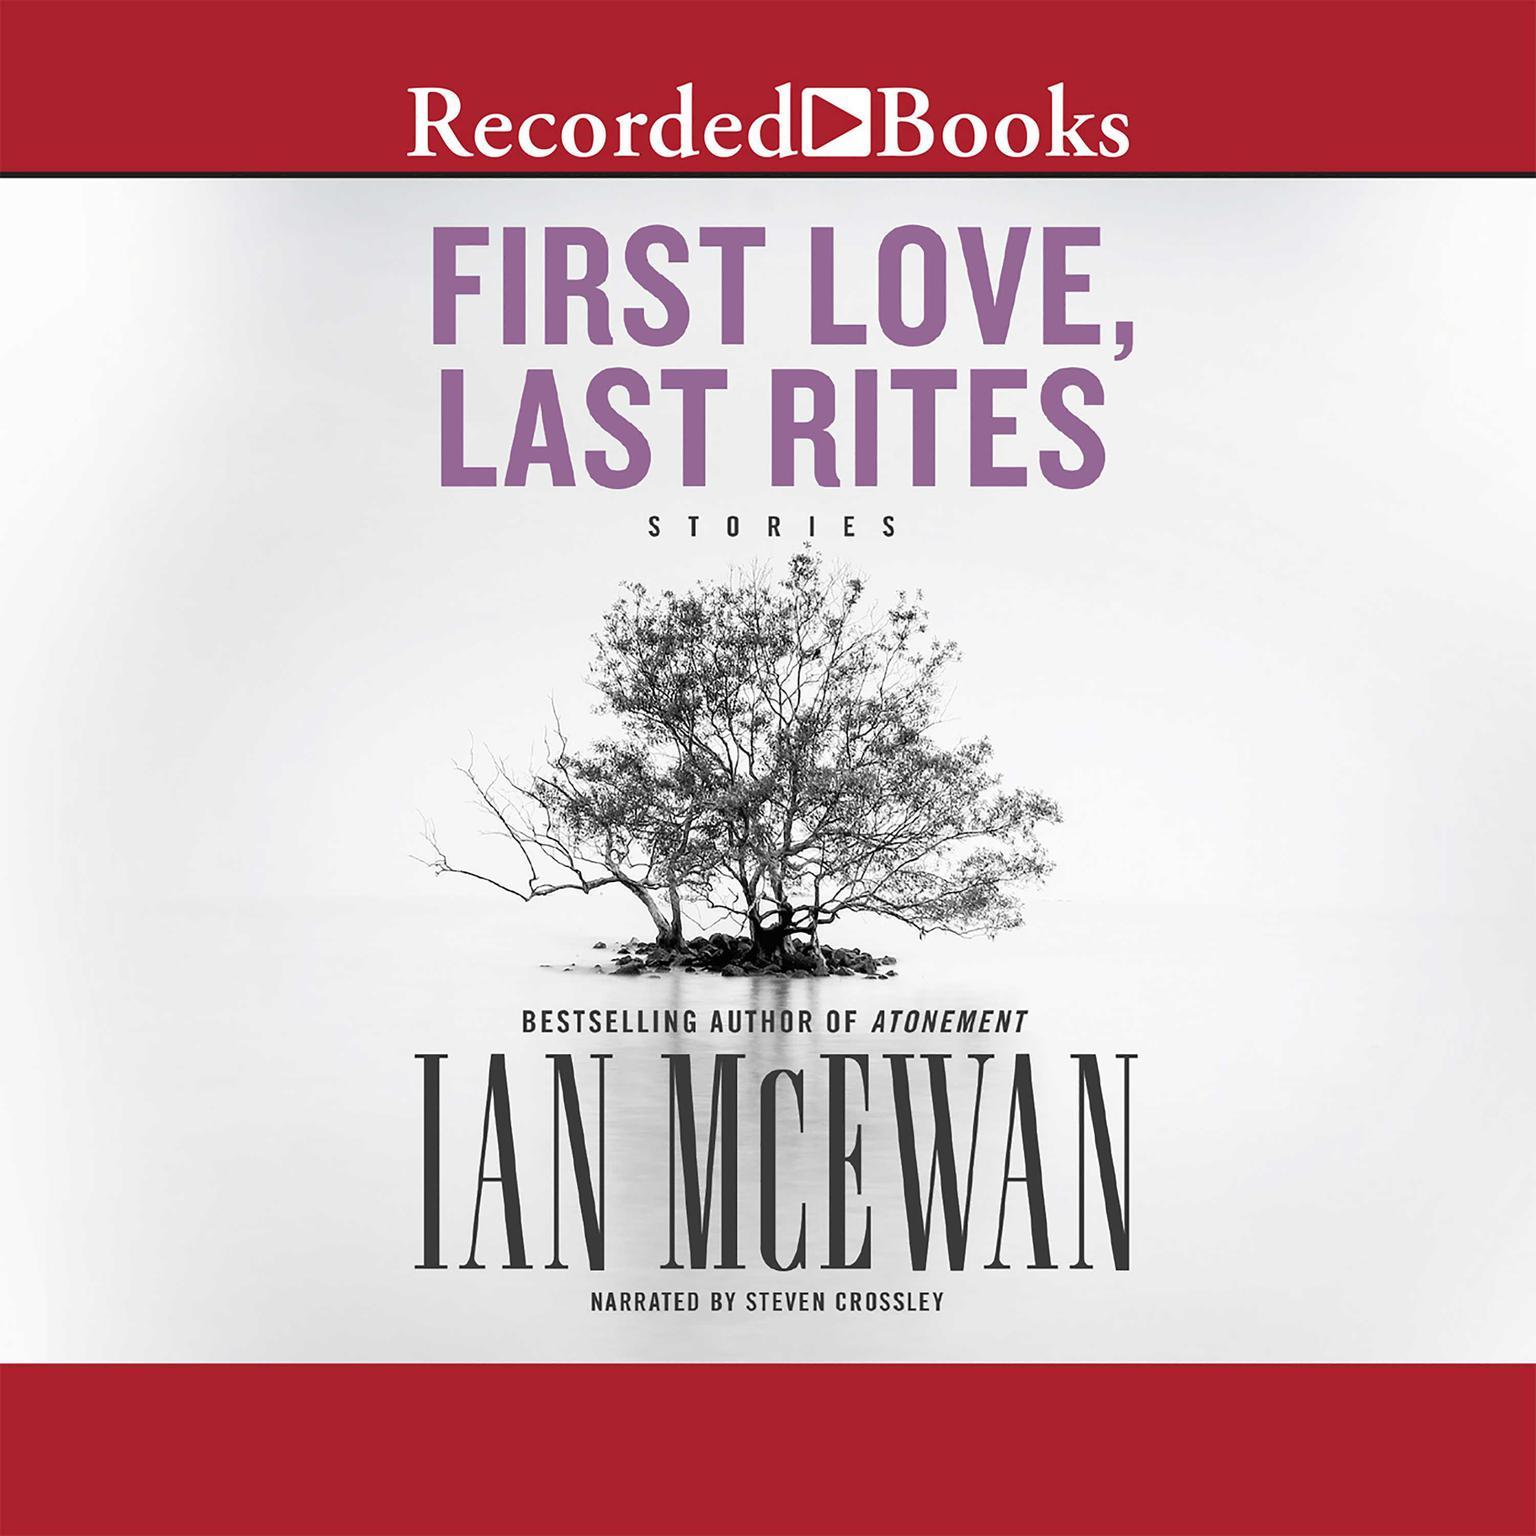 First Love, Last Rites: Stories Audiobook, by Ian McEwan